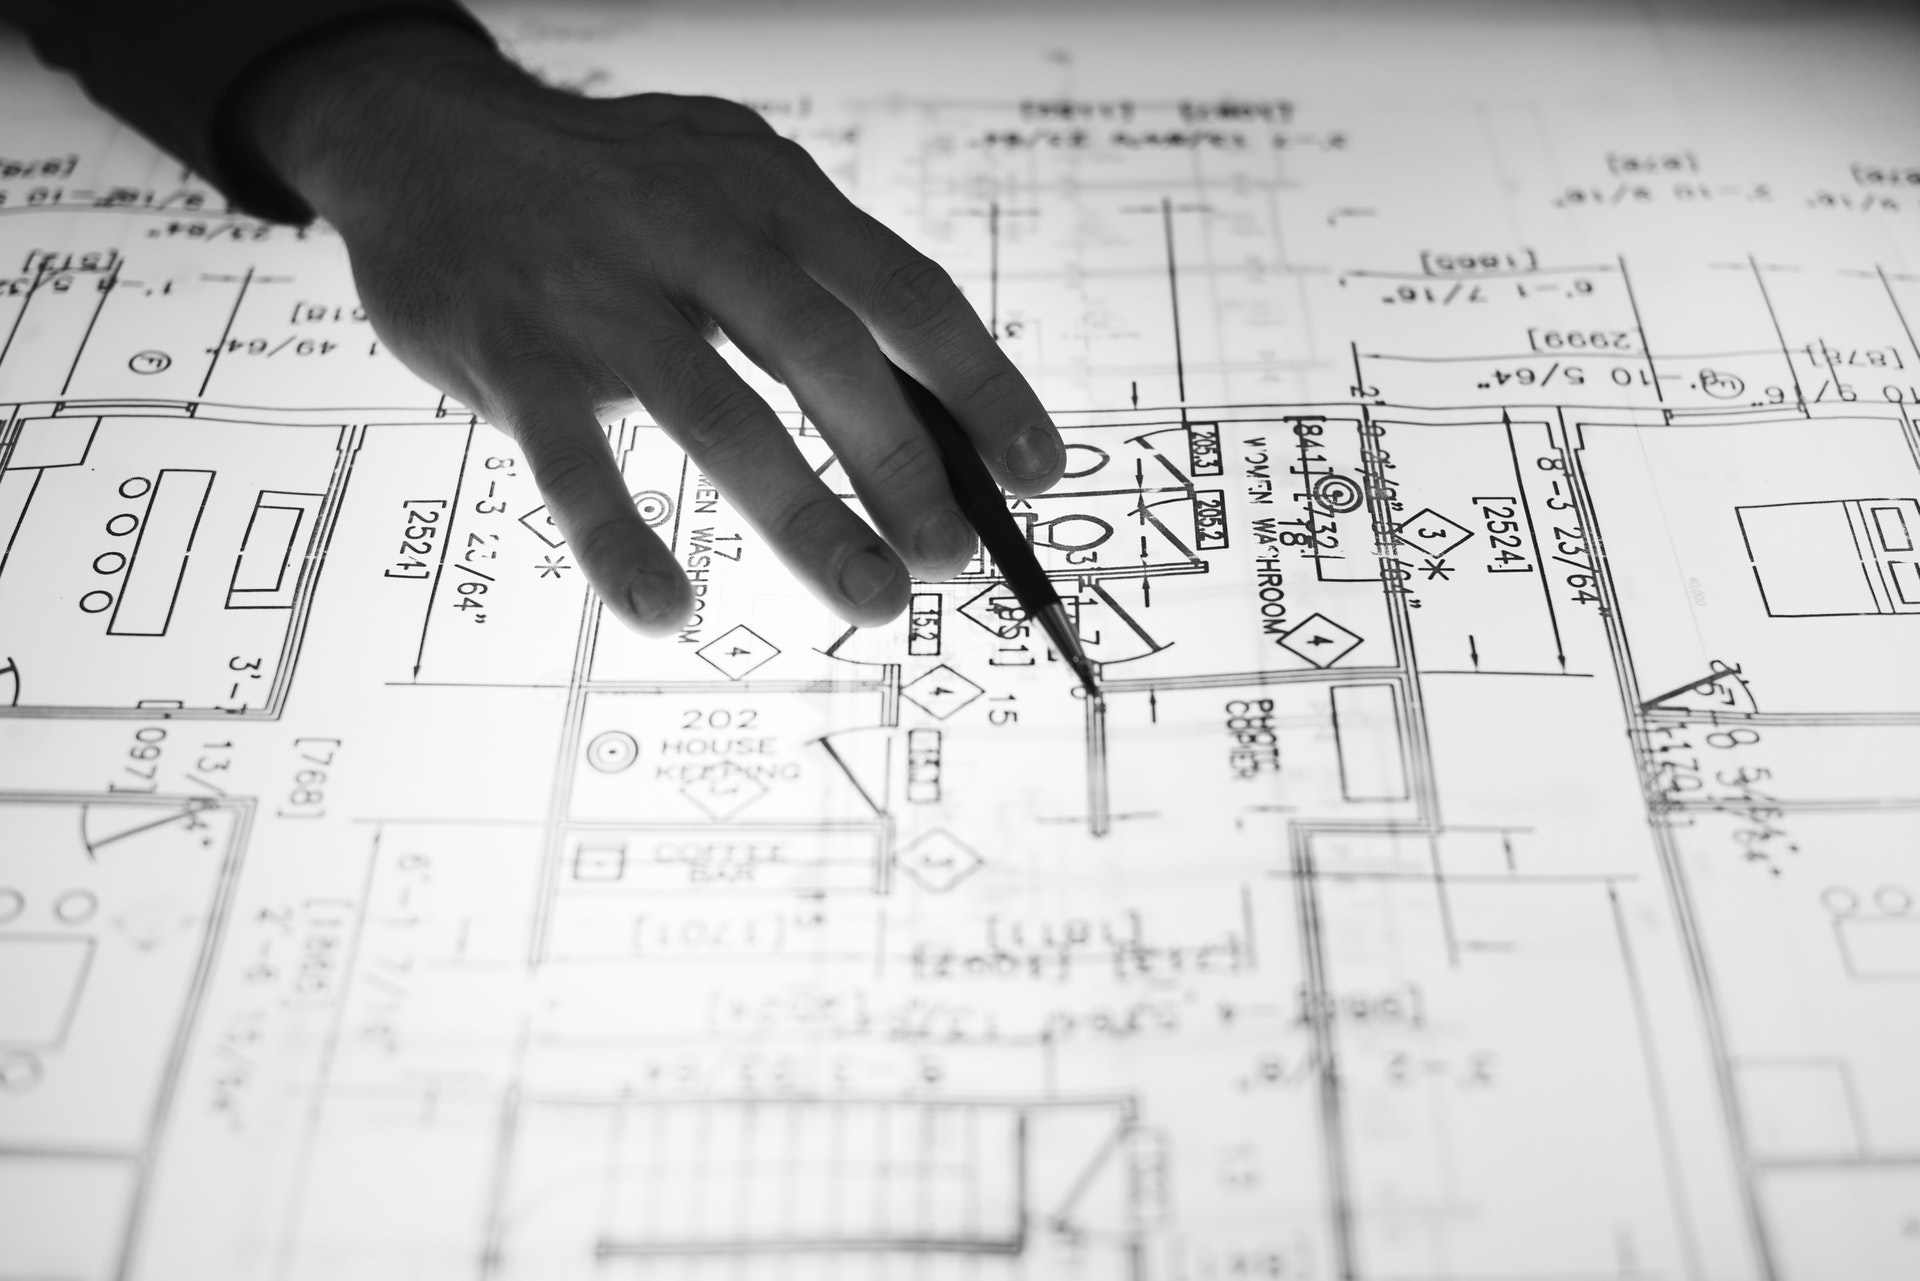 Construction Business Management Software